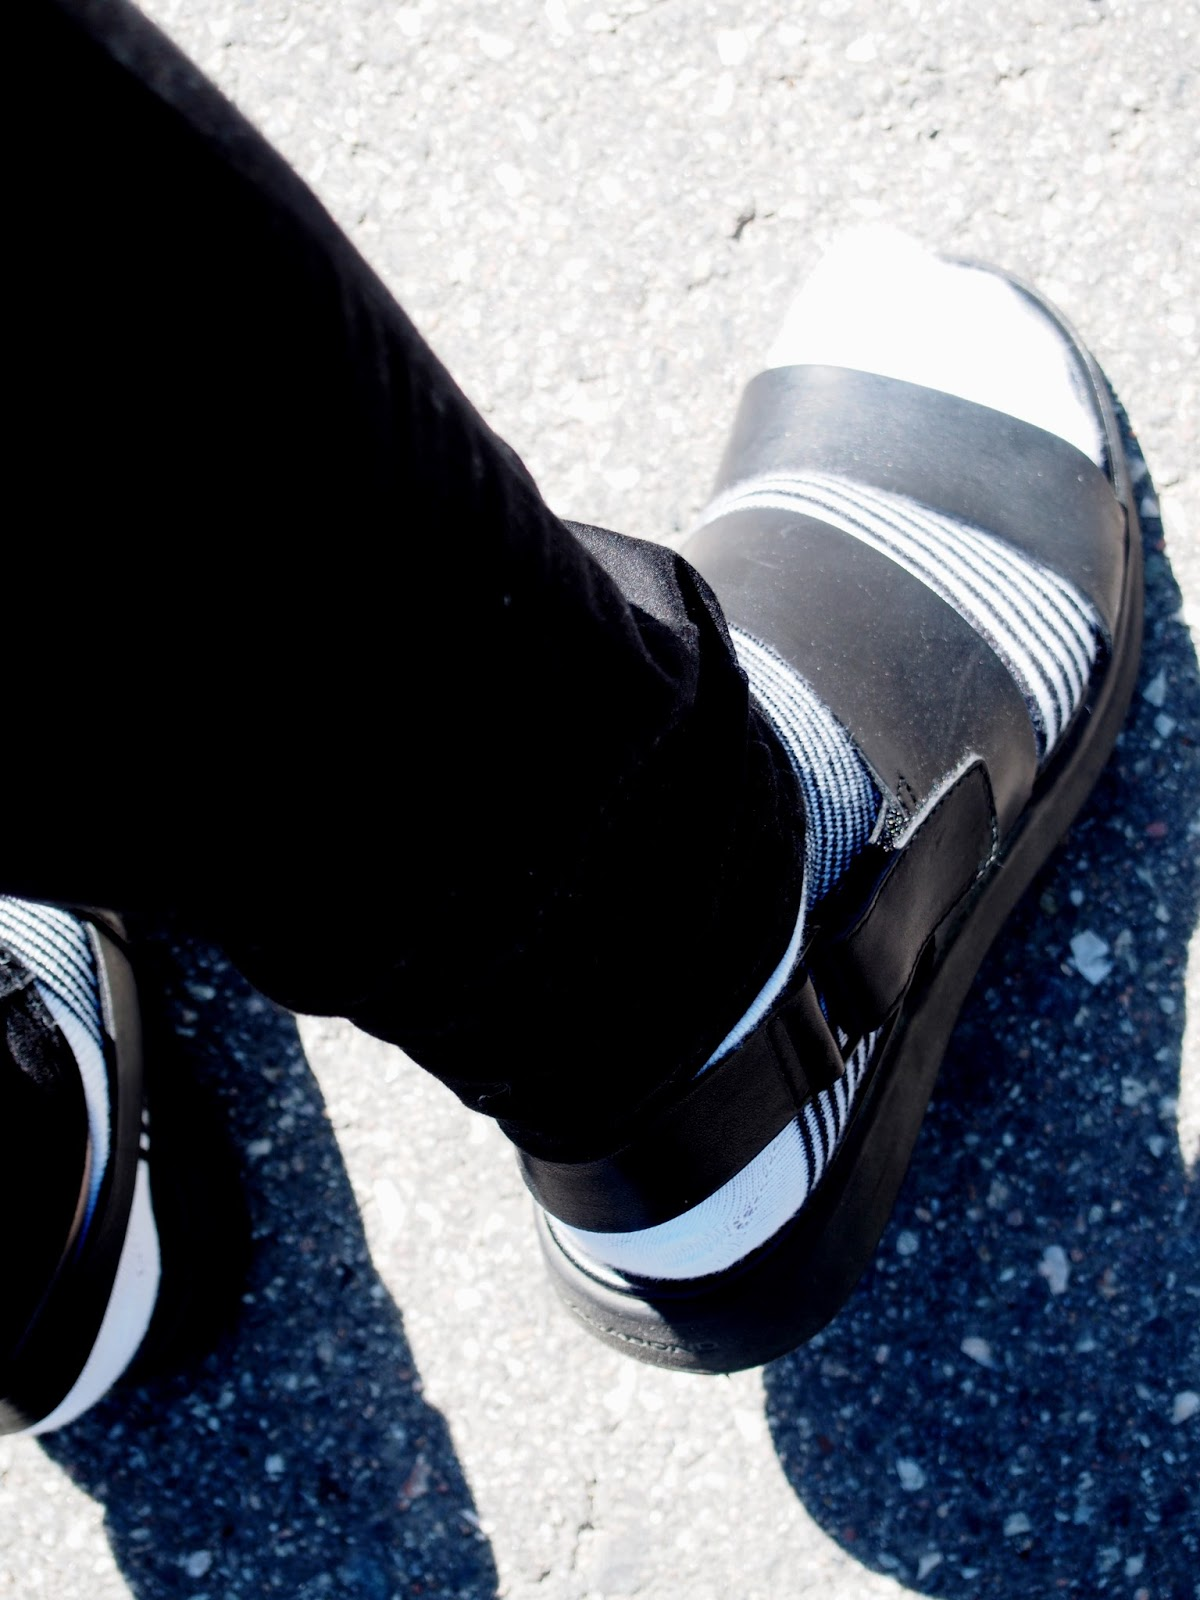 bold strong style classical chic modern code beautiful women accessoriez sukat sandaalit sukka tyyli musta valkoinen asu ootd outfit